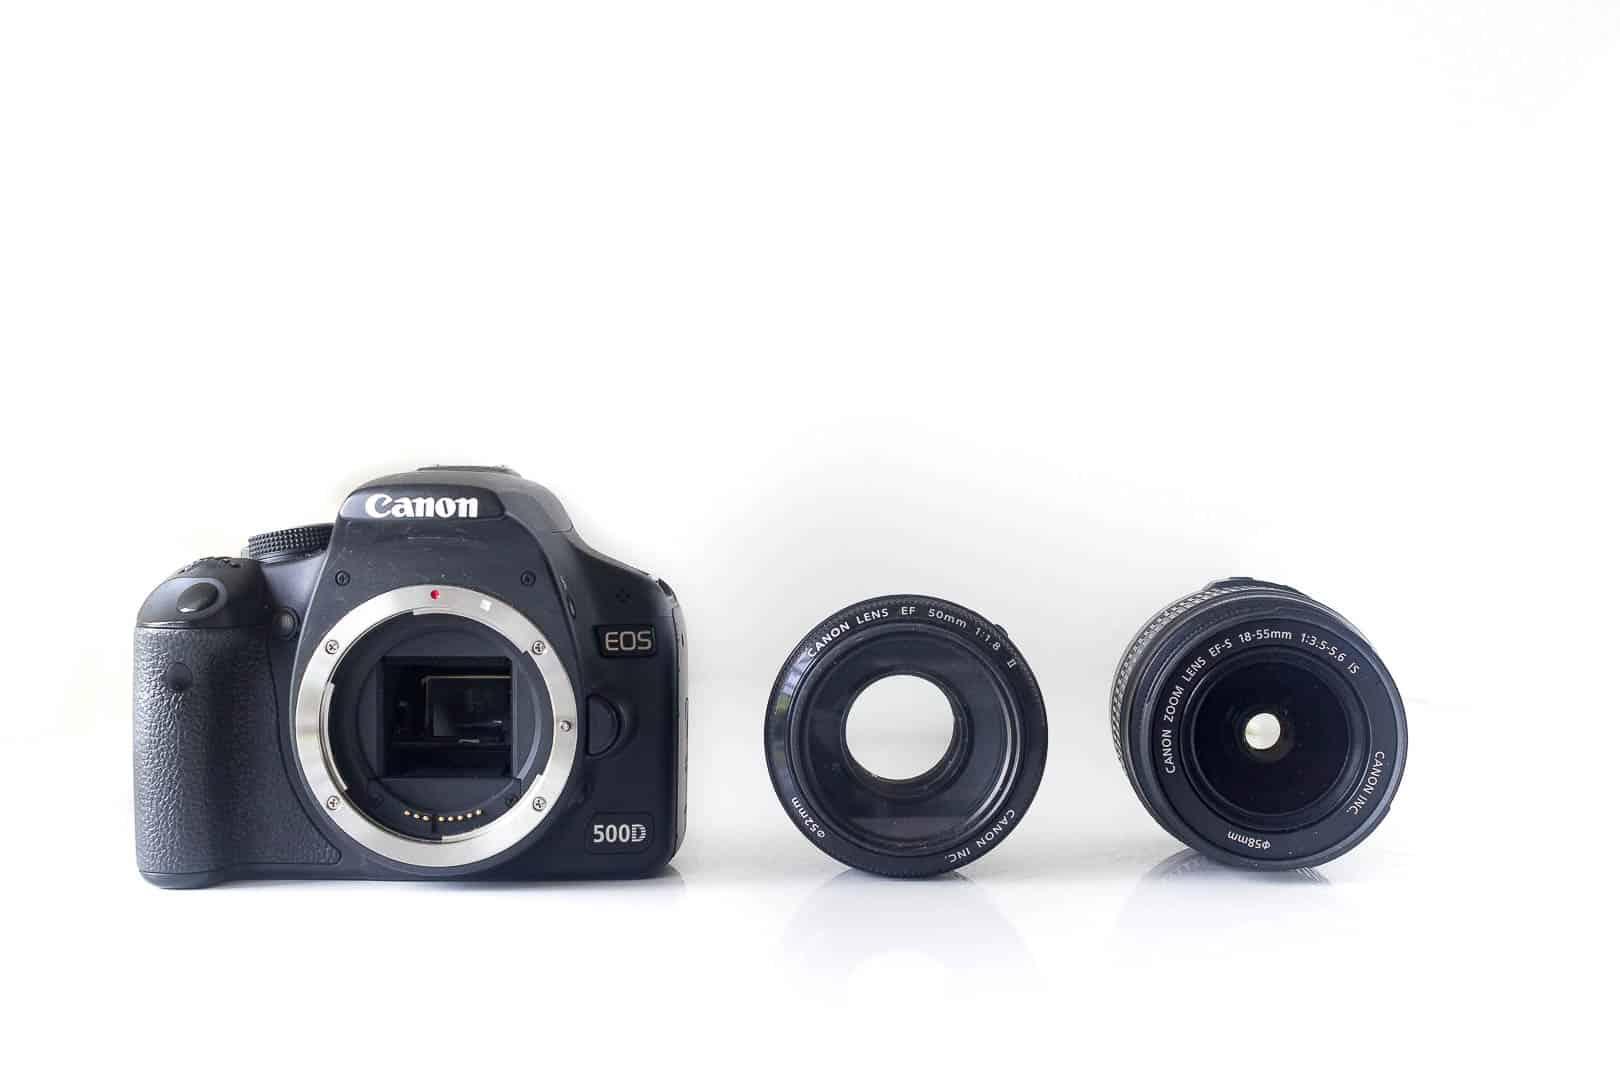 canon kamera og objektiver - 50 mm objektiv